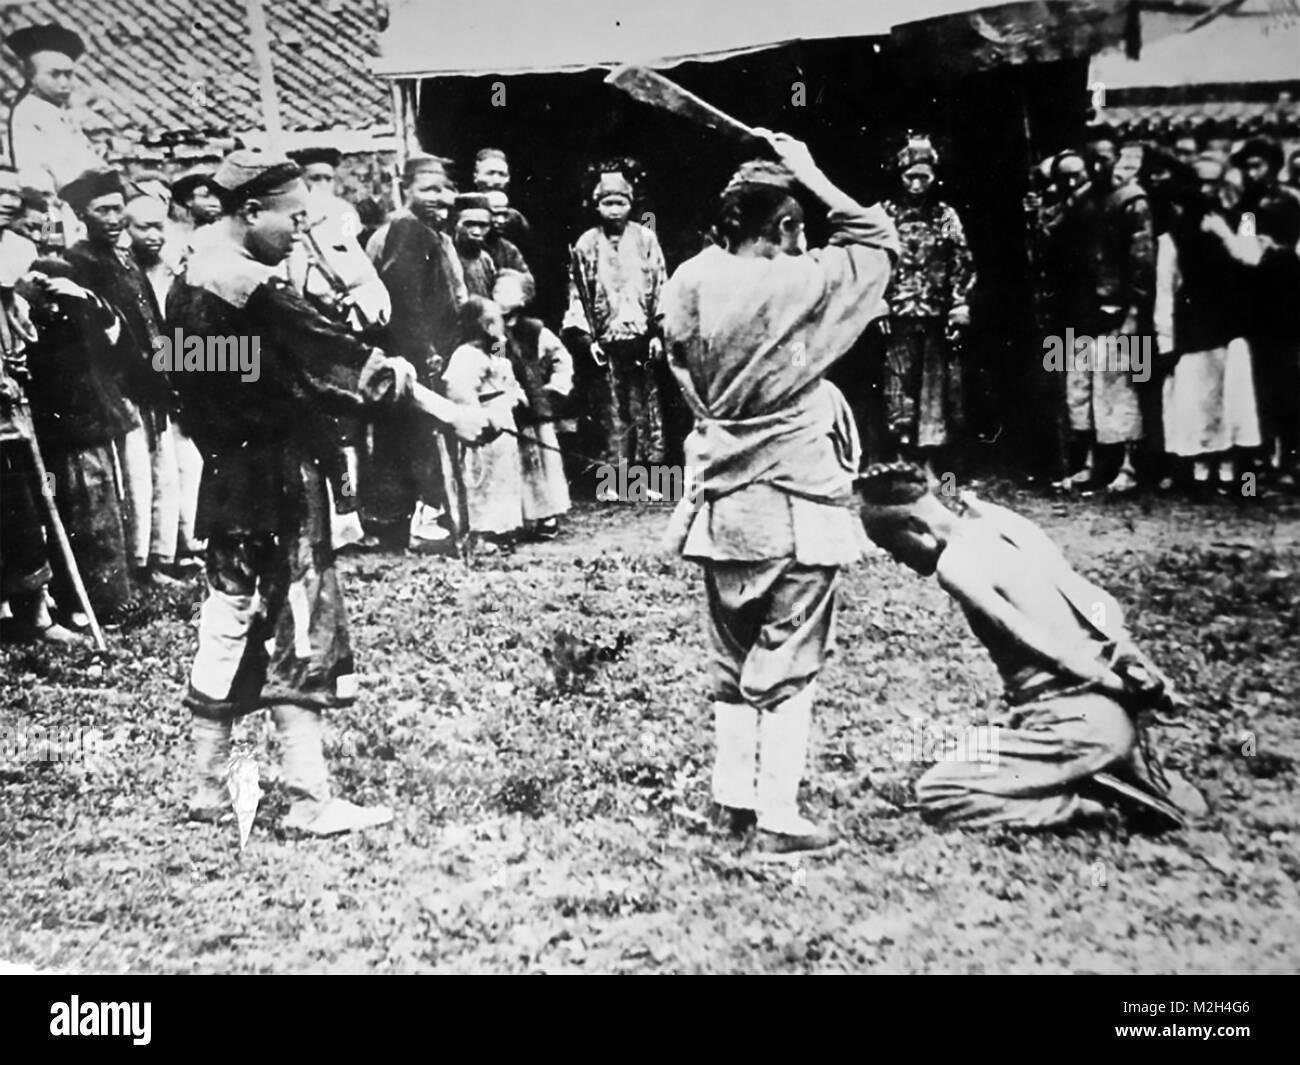 BOXER REBELLION 1899-1901. Unidentified atrocity. - Stock Image